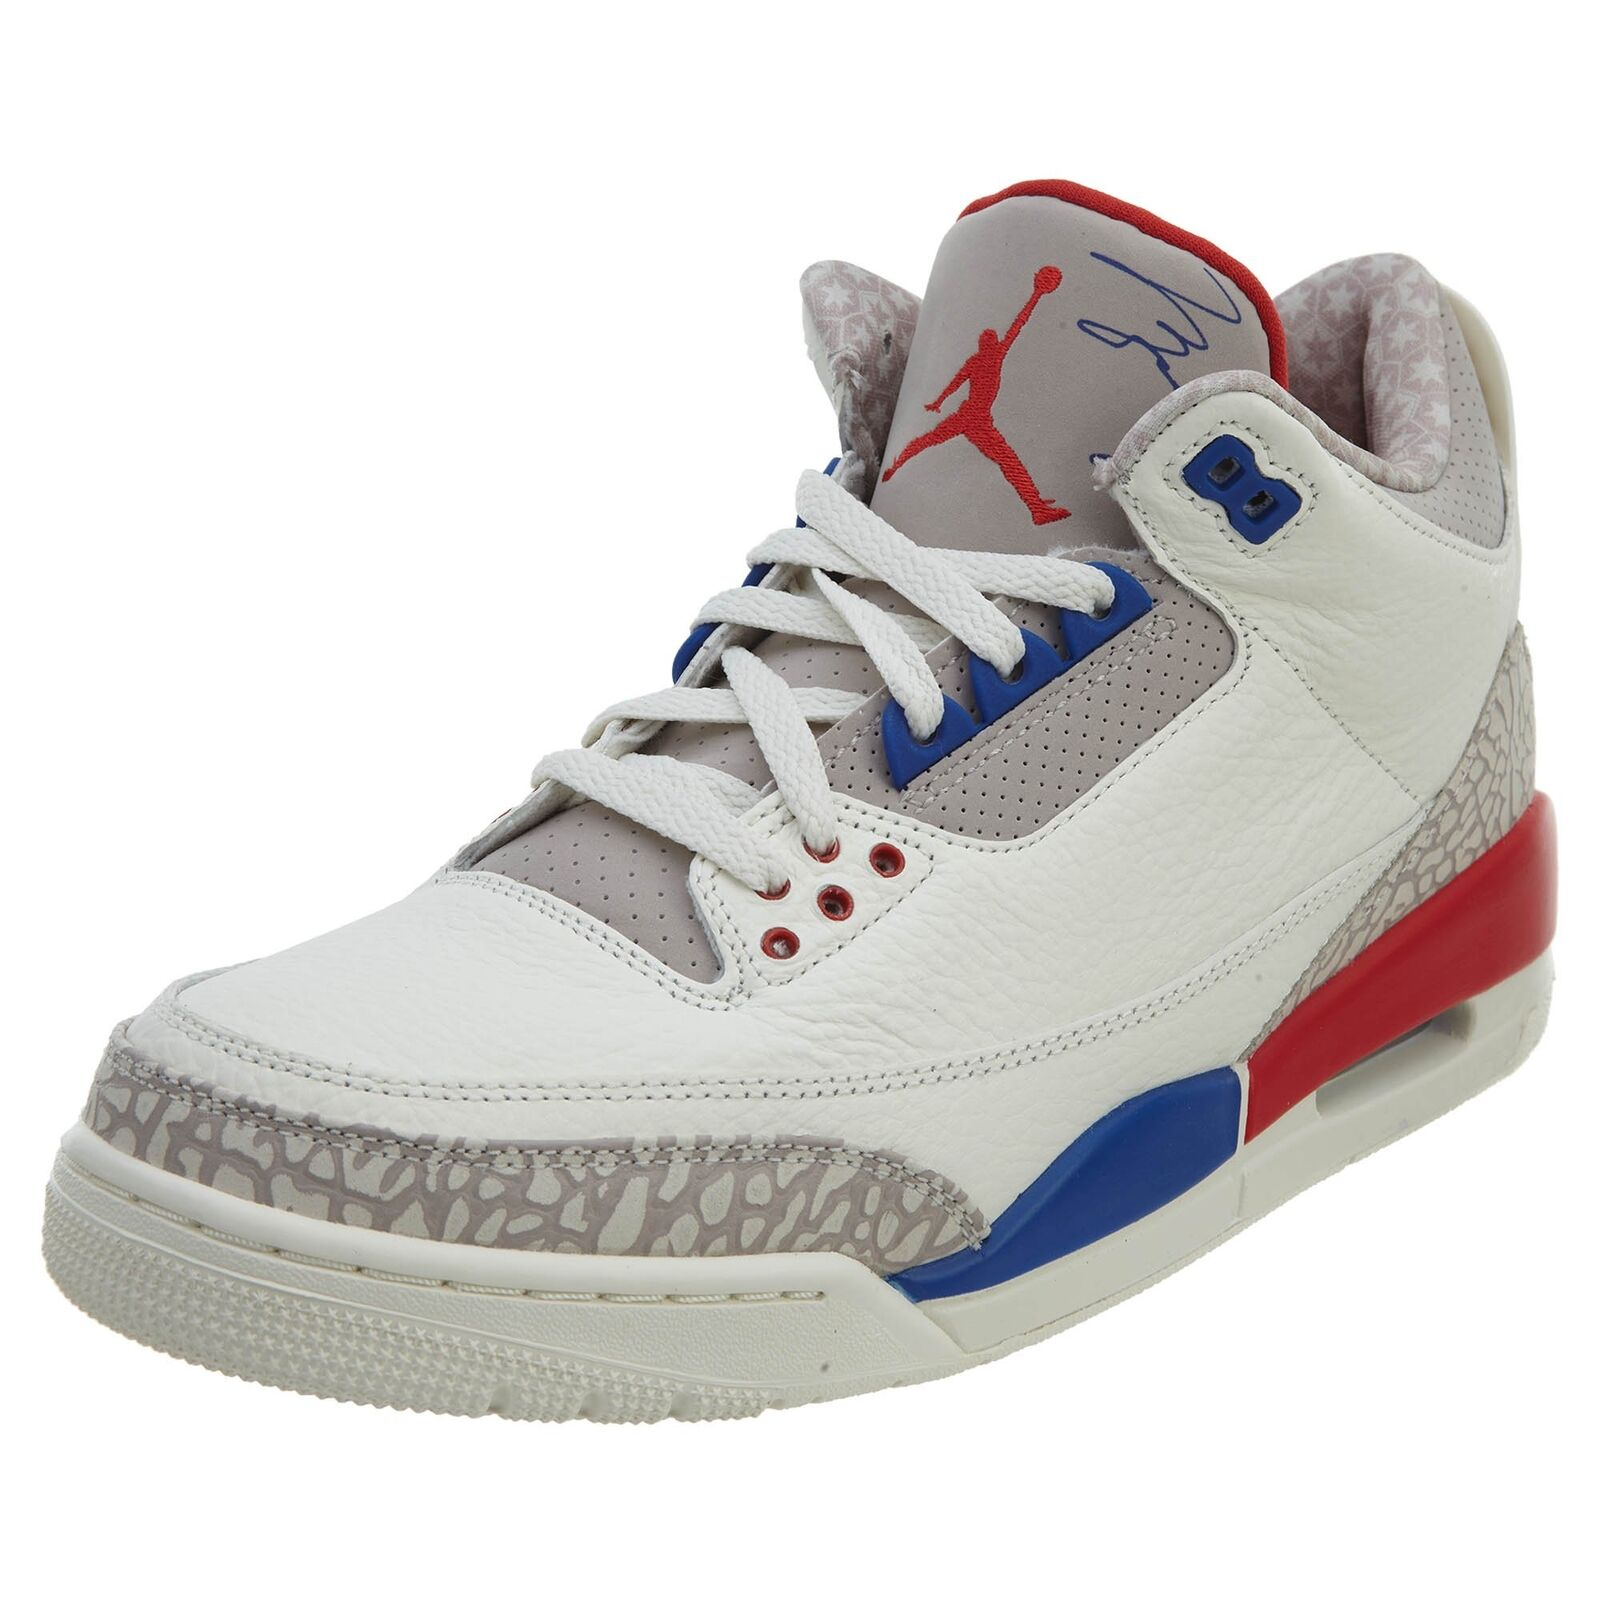 reputable site 790e5 66951 Nike Air Jordan 3 Retro International Flight Charity Game 136064-140 ...